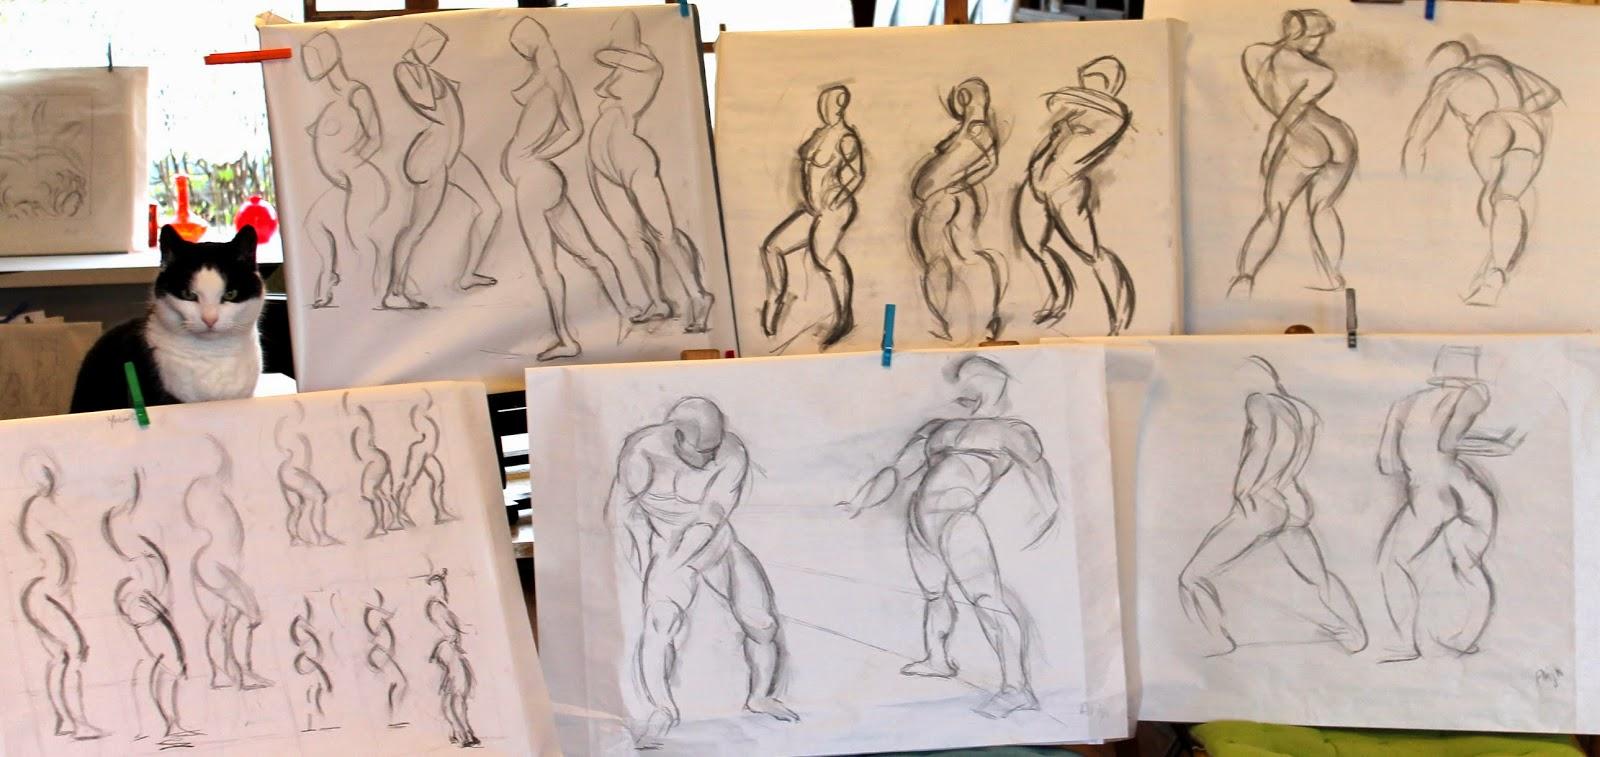 korte schetsen maken,schetsen,tekenles Amsterdam,tekenlessen Amsterdam,tekenles Rotterdam,tekenlessen Utrecht,tekenles,Utrecht